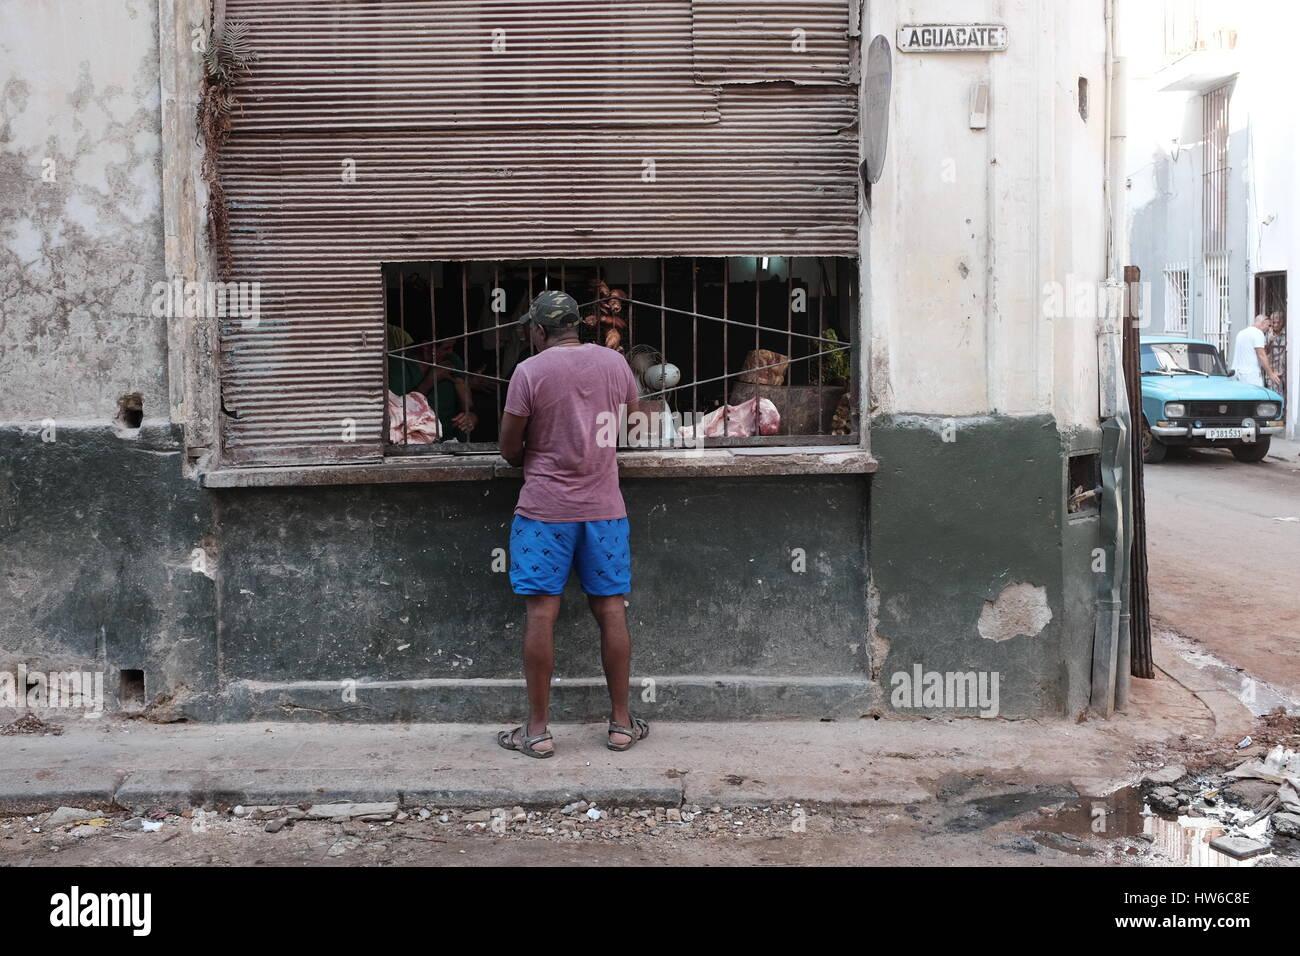 Meat seller on Havana street 2017 - Stock Image